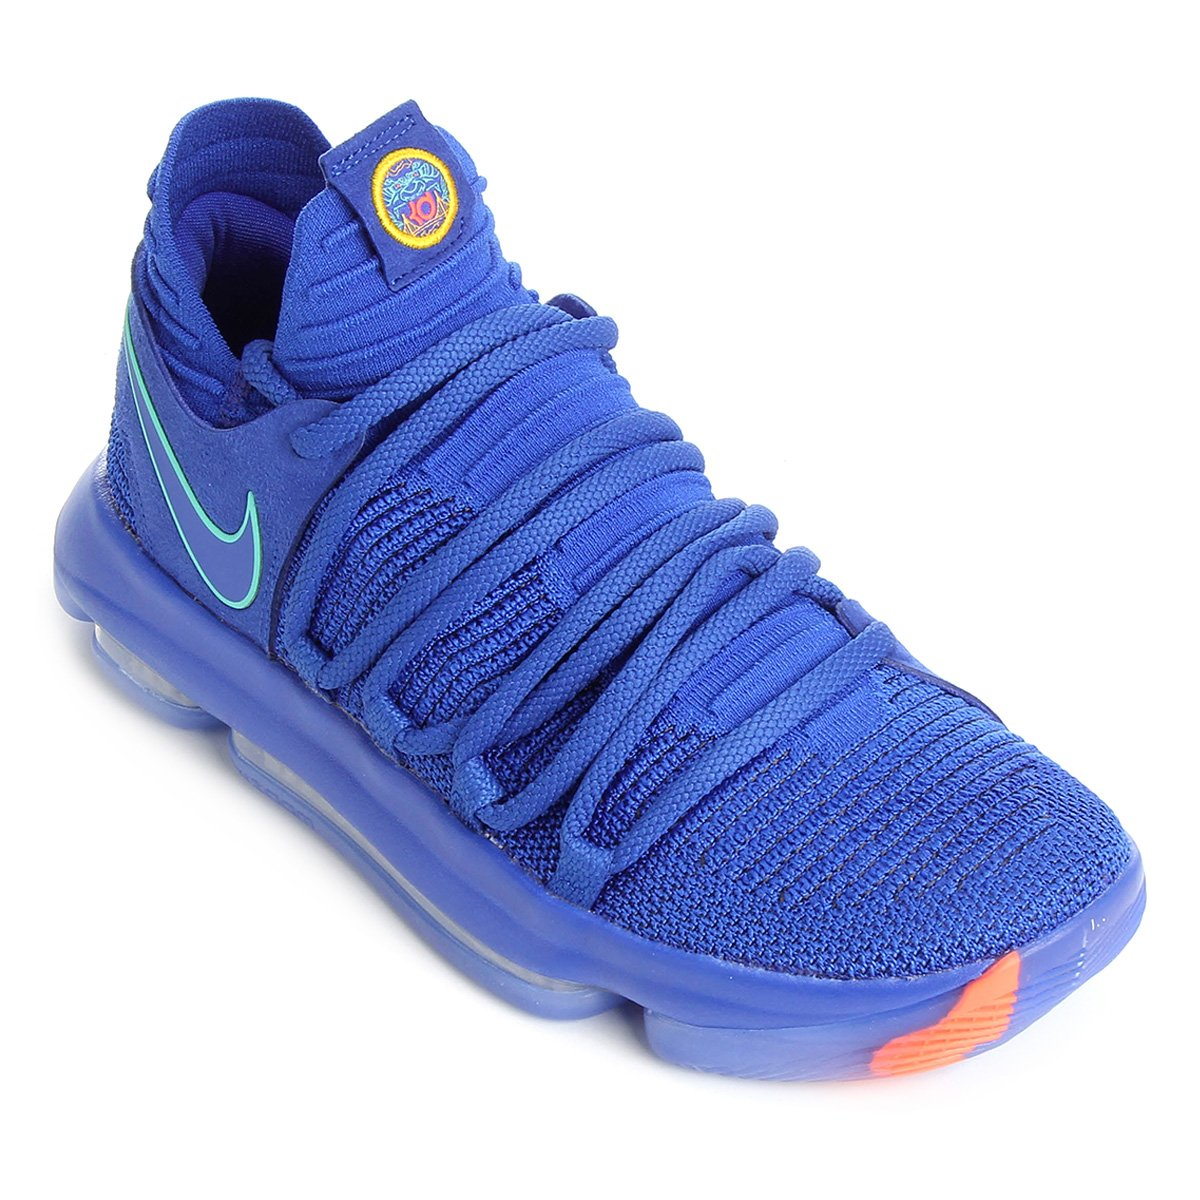 b682080a5b Tênis Nike Zoom KD 10 Masculino - Compre Agora